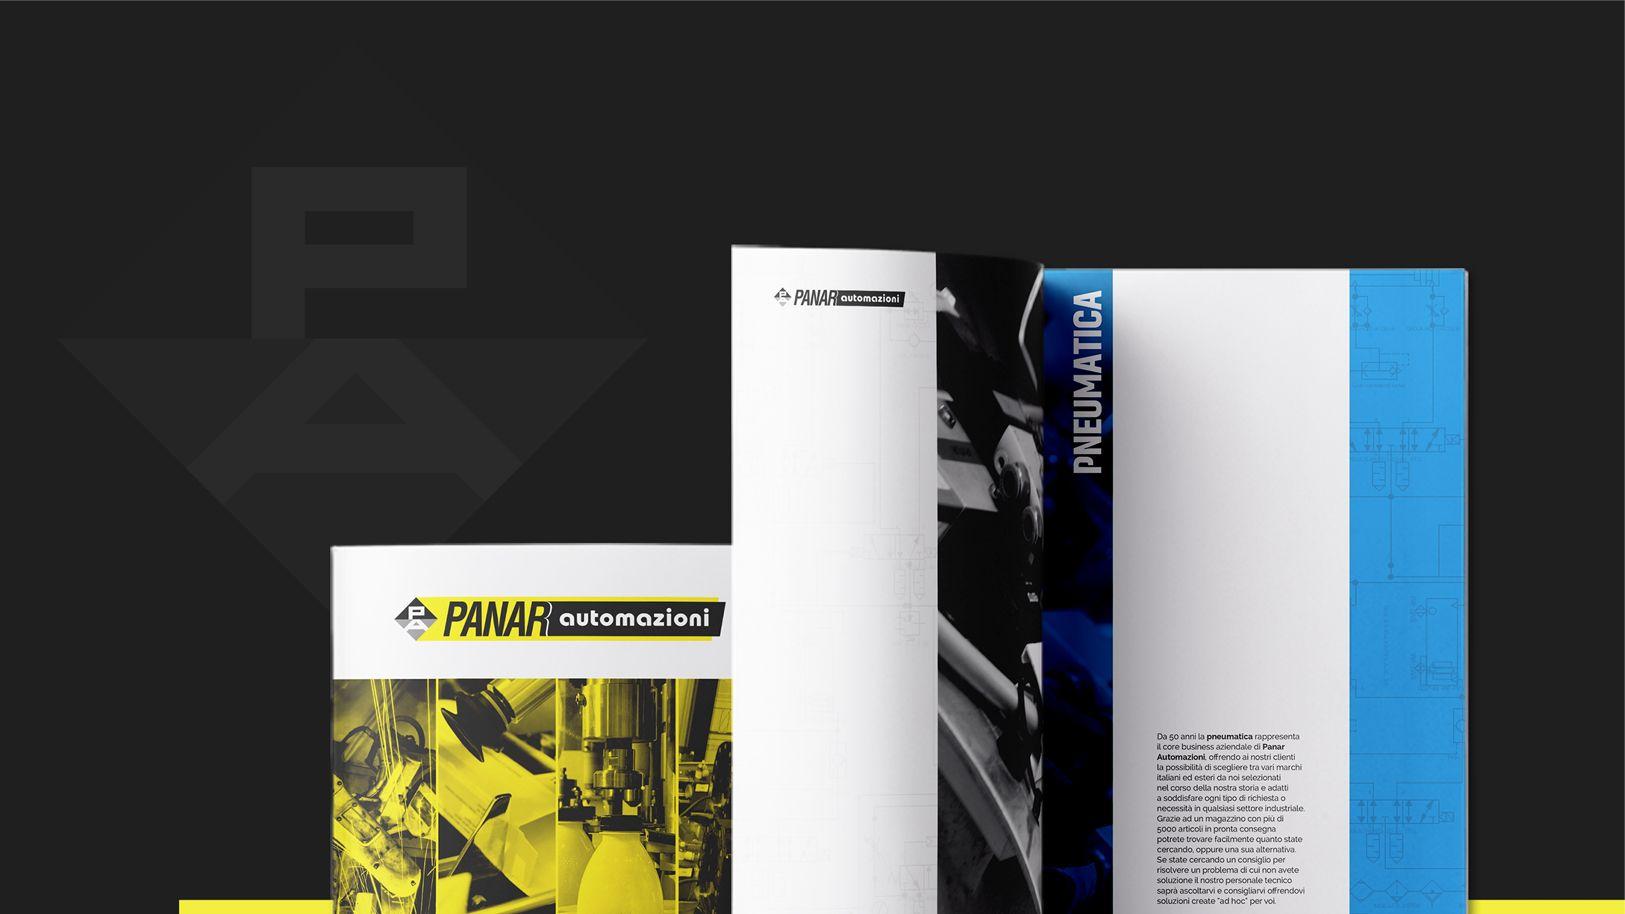 Portfolio-Graphic-Design_Misurauno_Canvas_Catalogo-2018-Panar_2_01-compressor.jpg